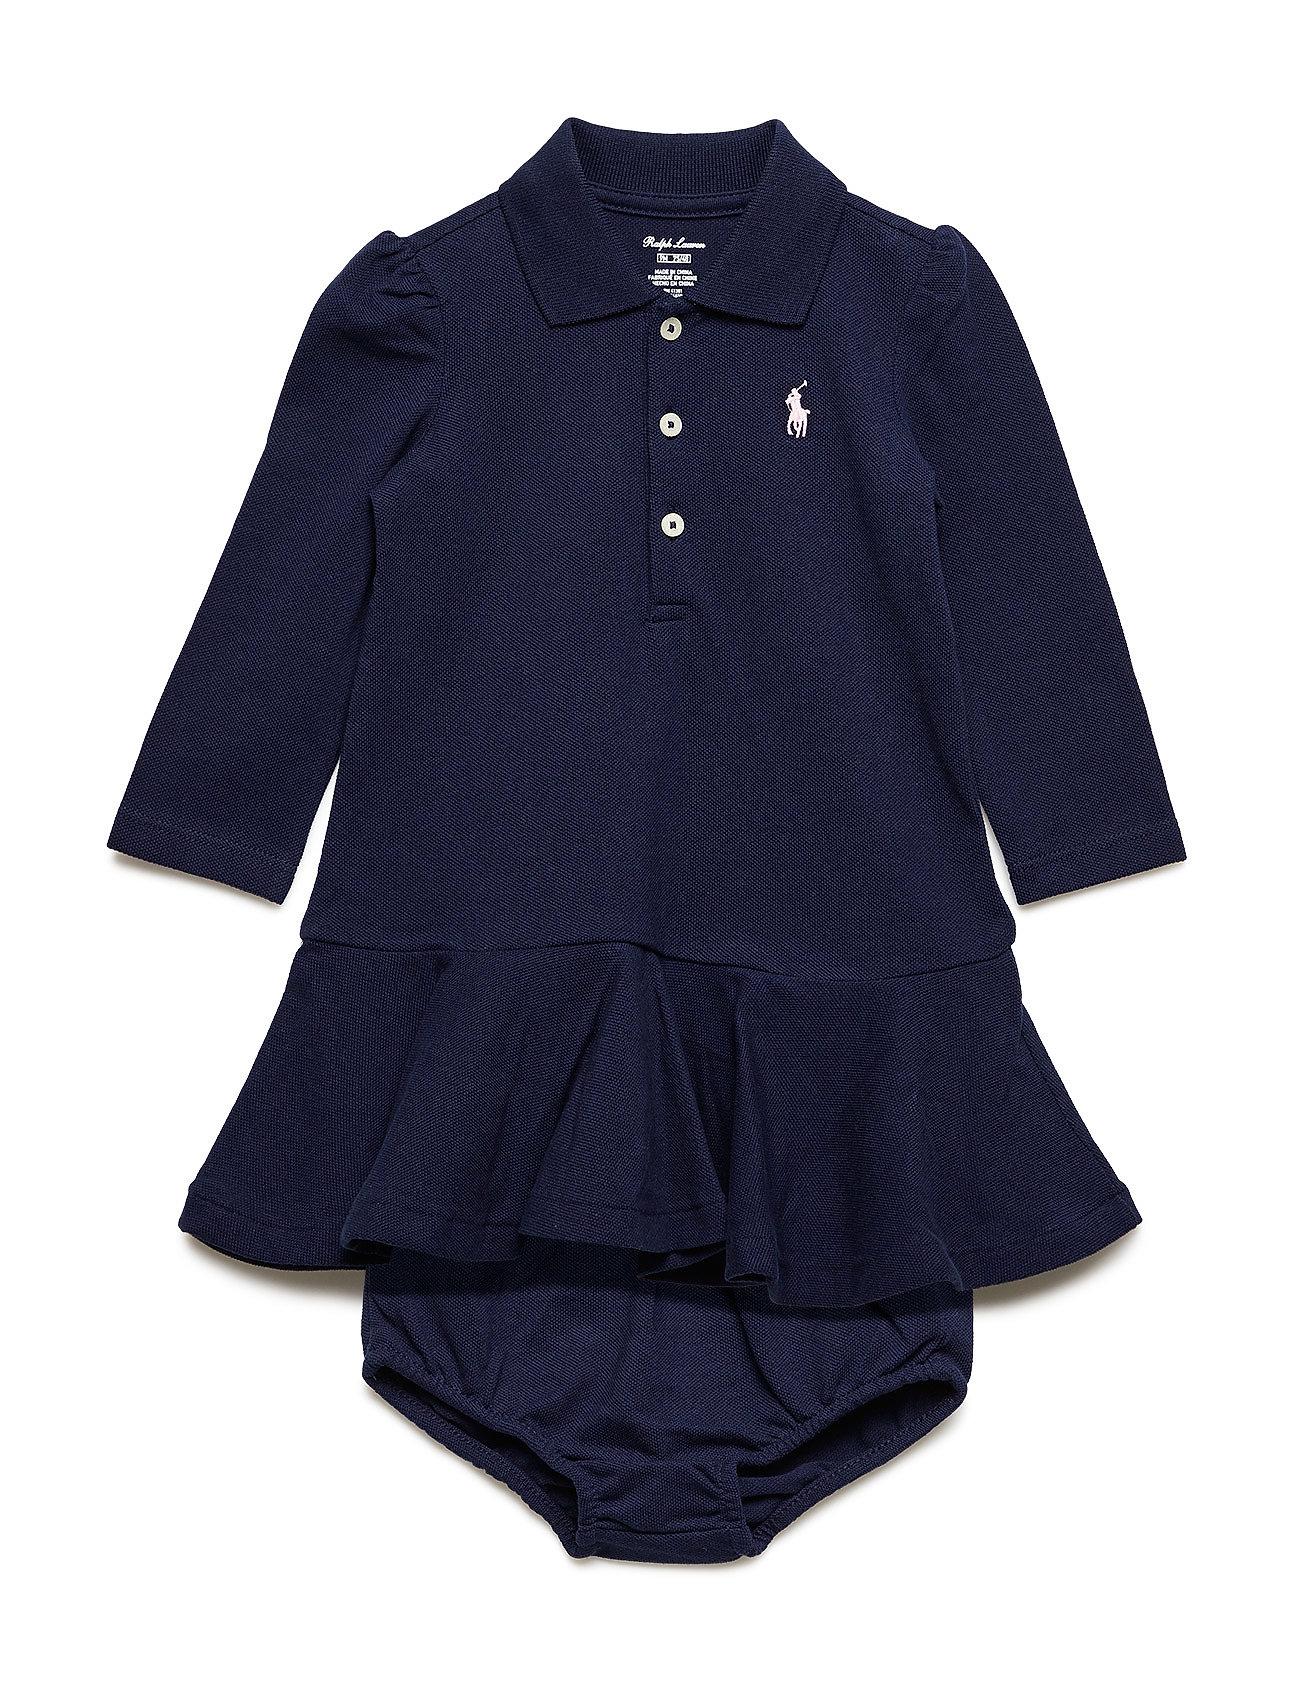 dcfb79ecfe Polo Dress & Bloomer